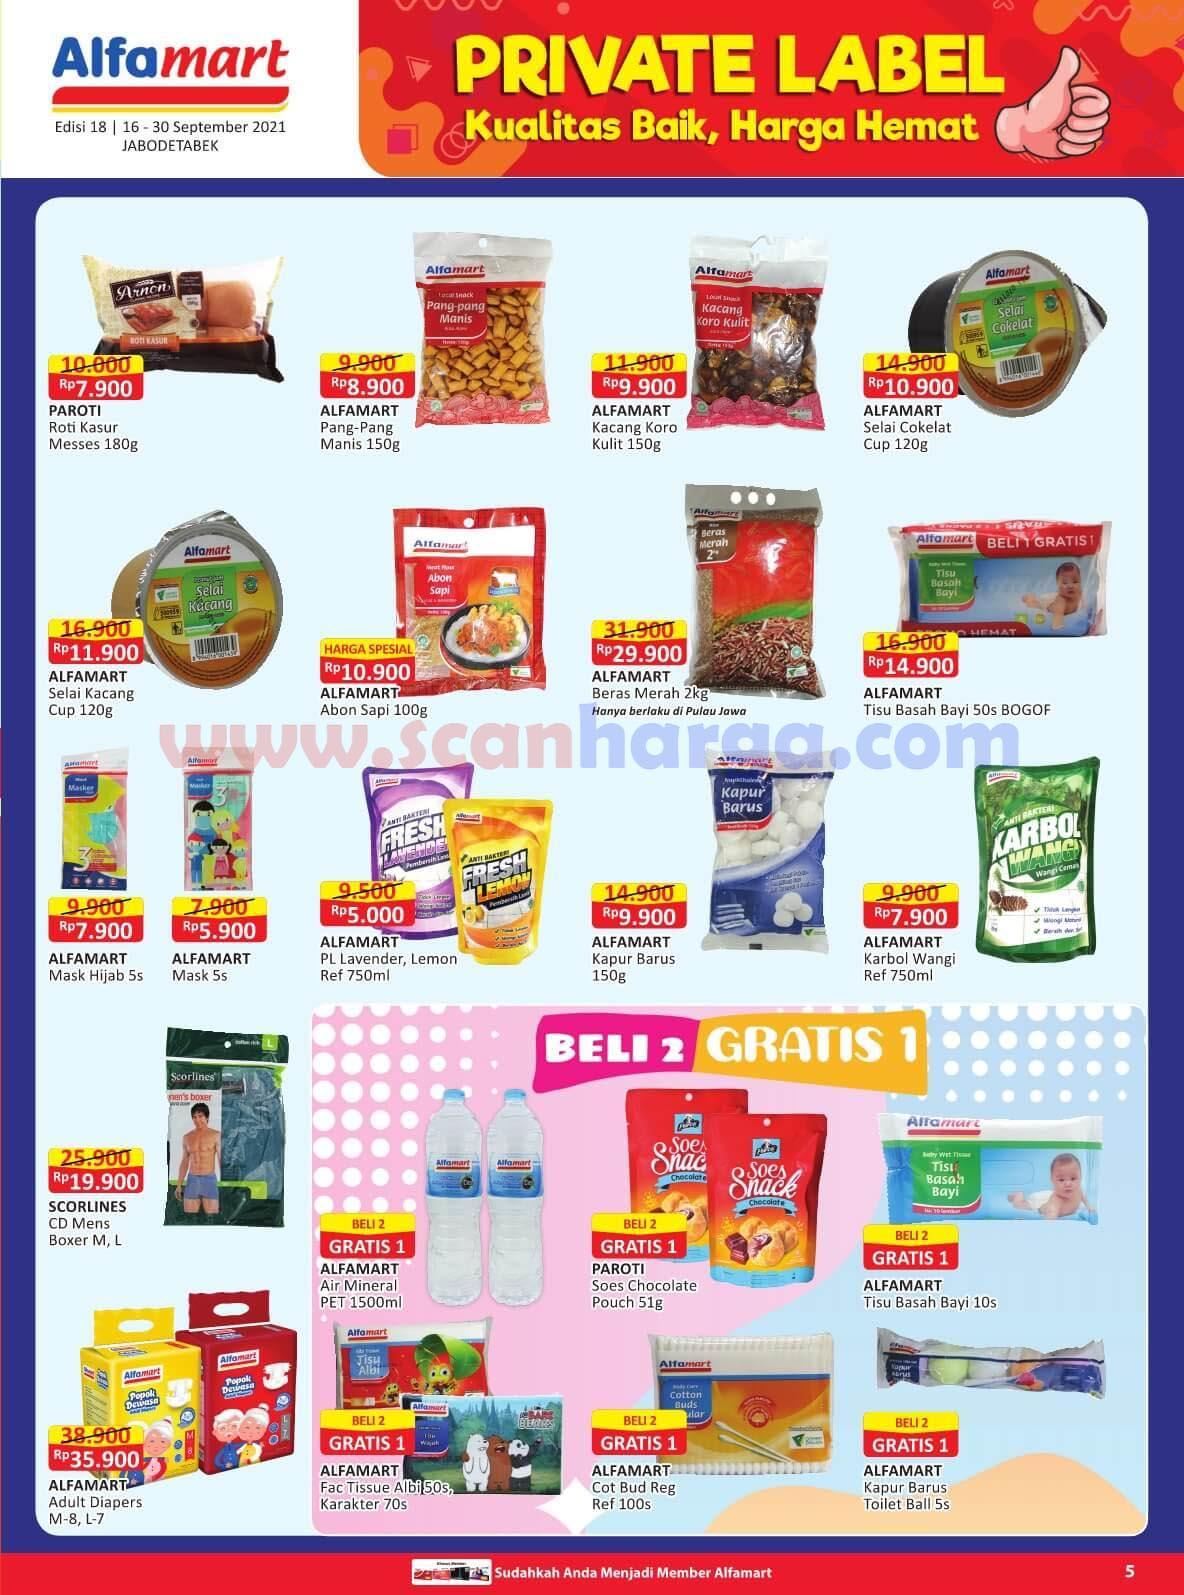 Katalog Promo Alfamart 16 - 30 September 2021 5